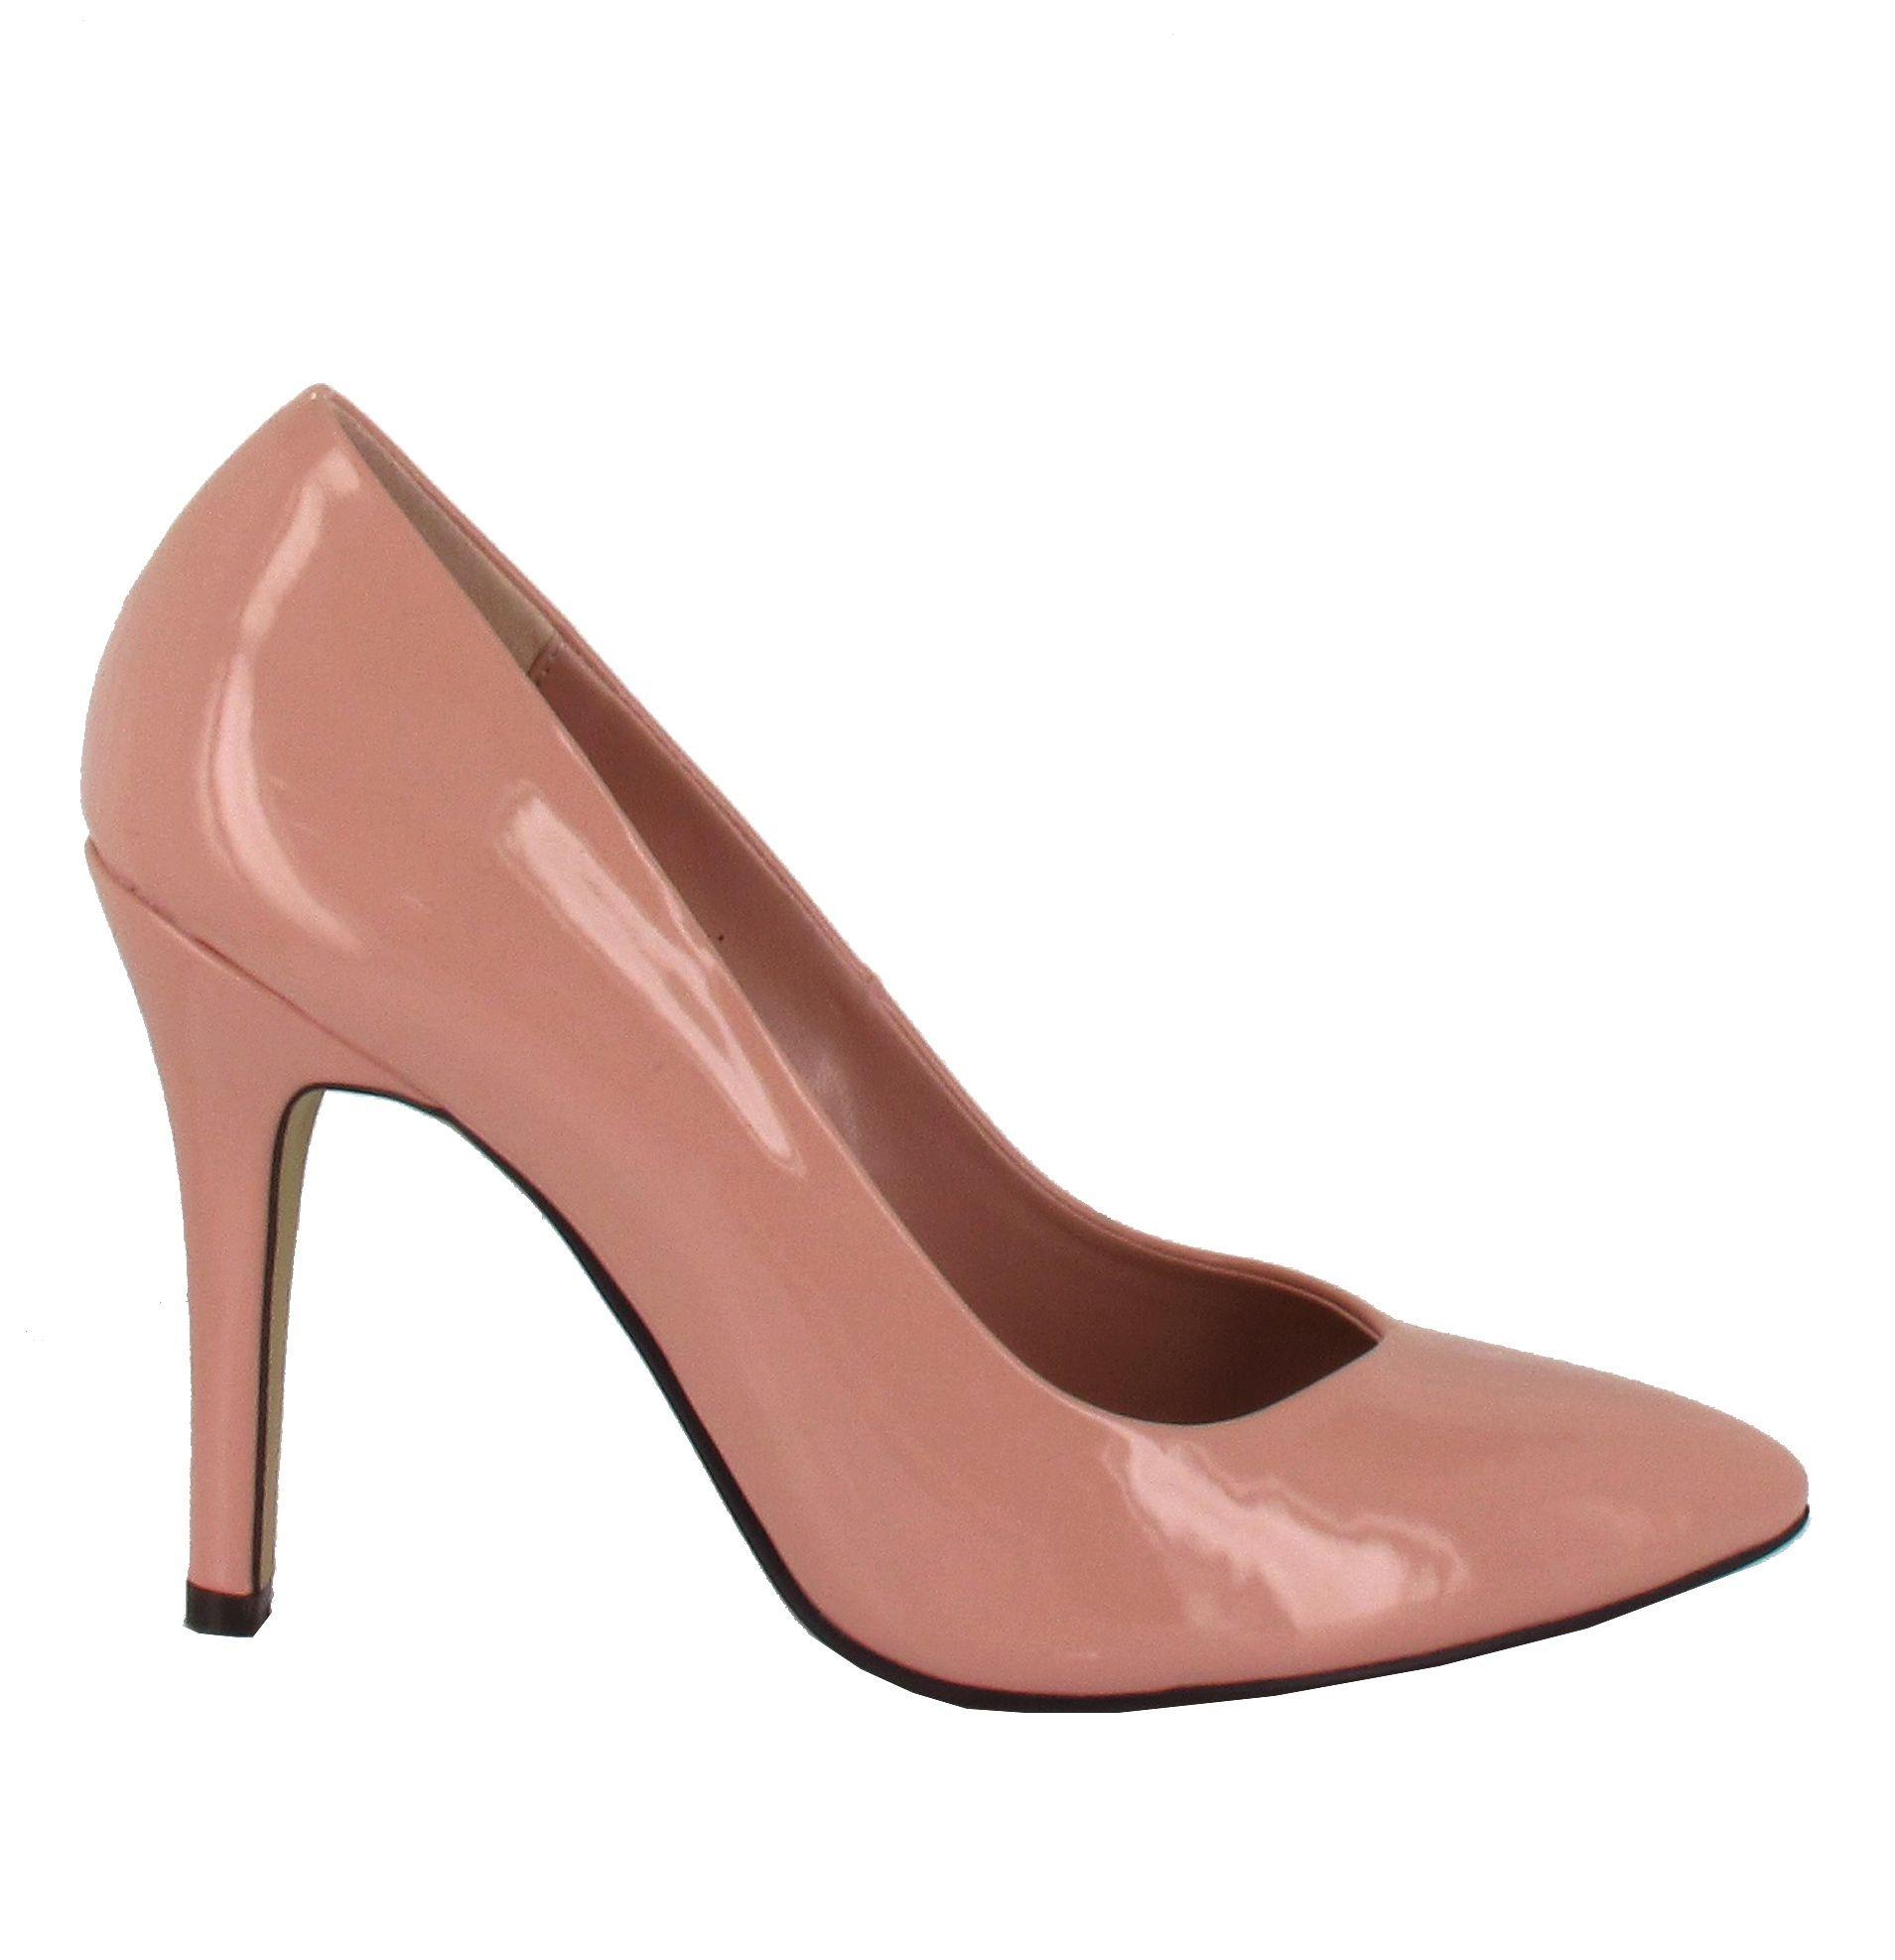 Zapato de tacón alto con punta fina, en tono Rosa. Modelo básico, no puede faltar en tu armario. Ref.6027 //High heel pointed toe shoe in Pink colour. A basic model, indispensable for your wardrobe. Ref.6027